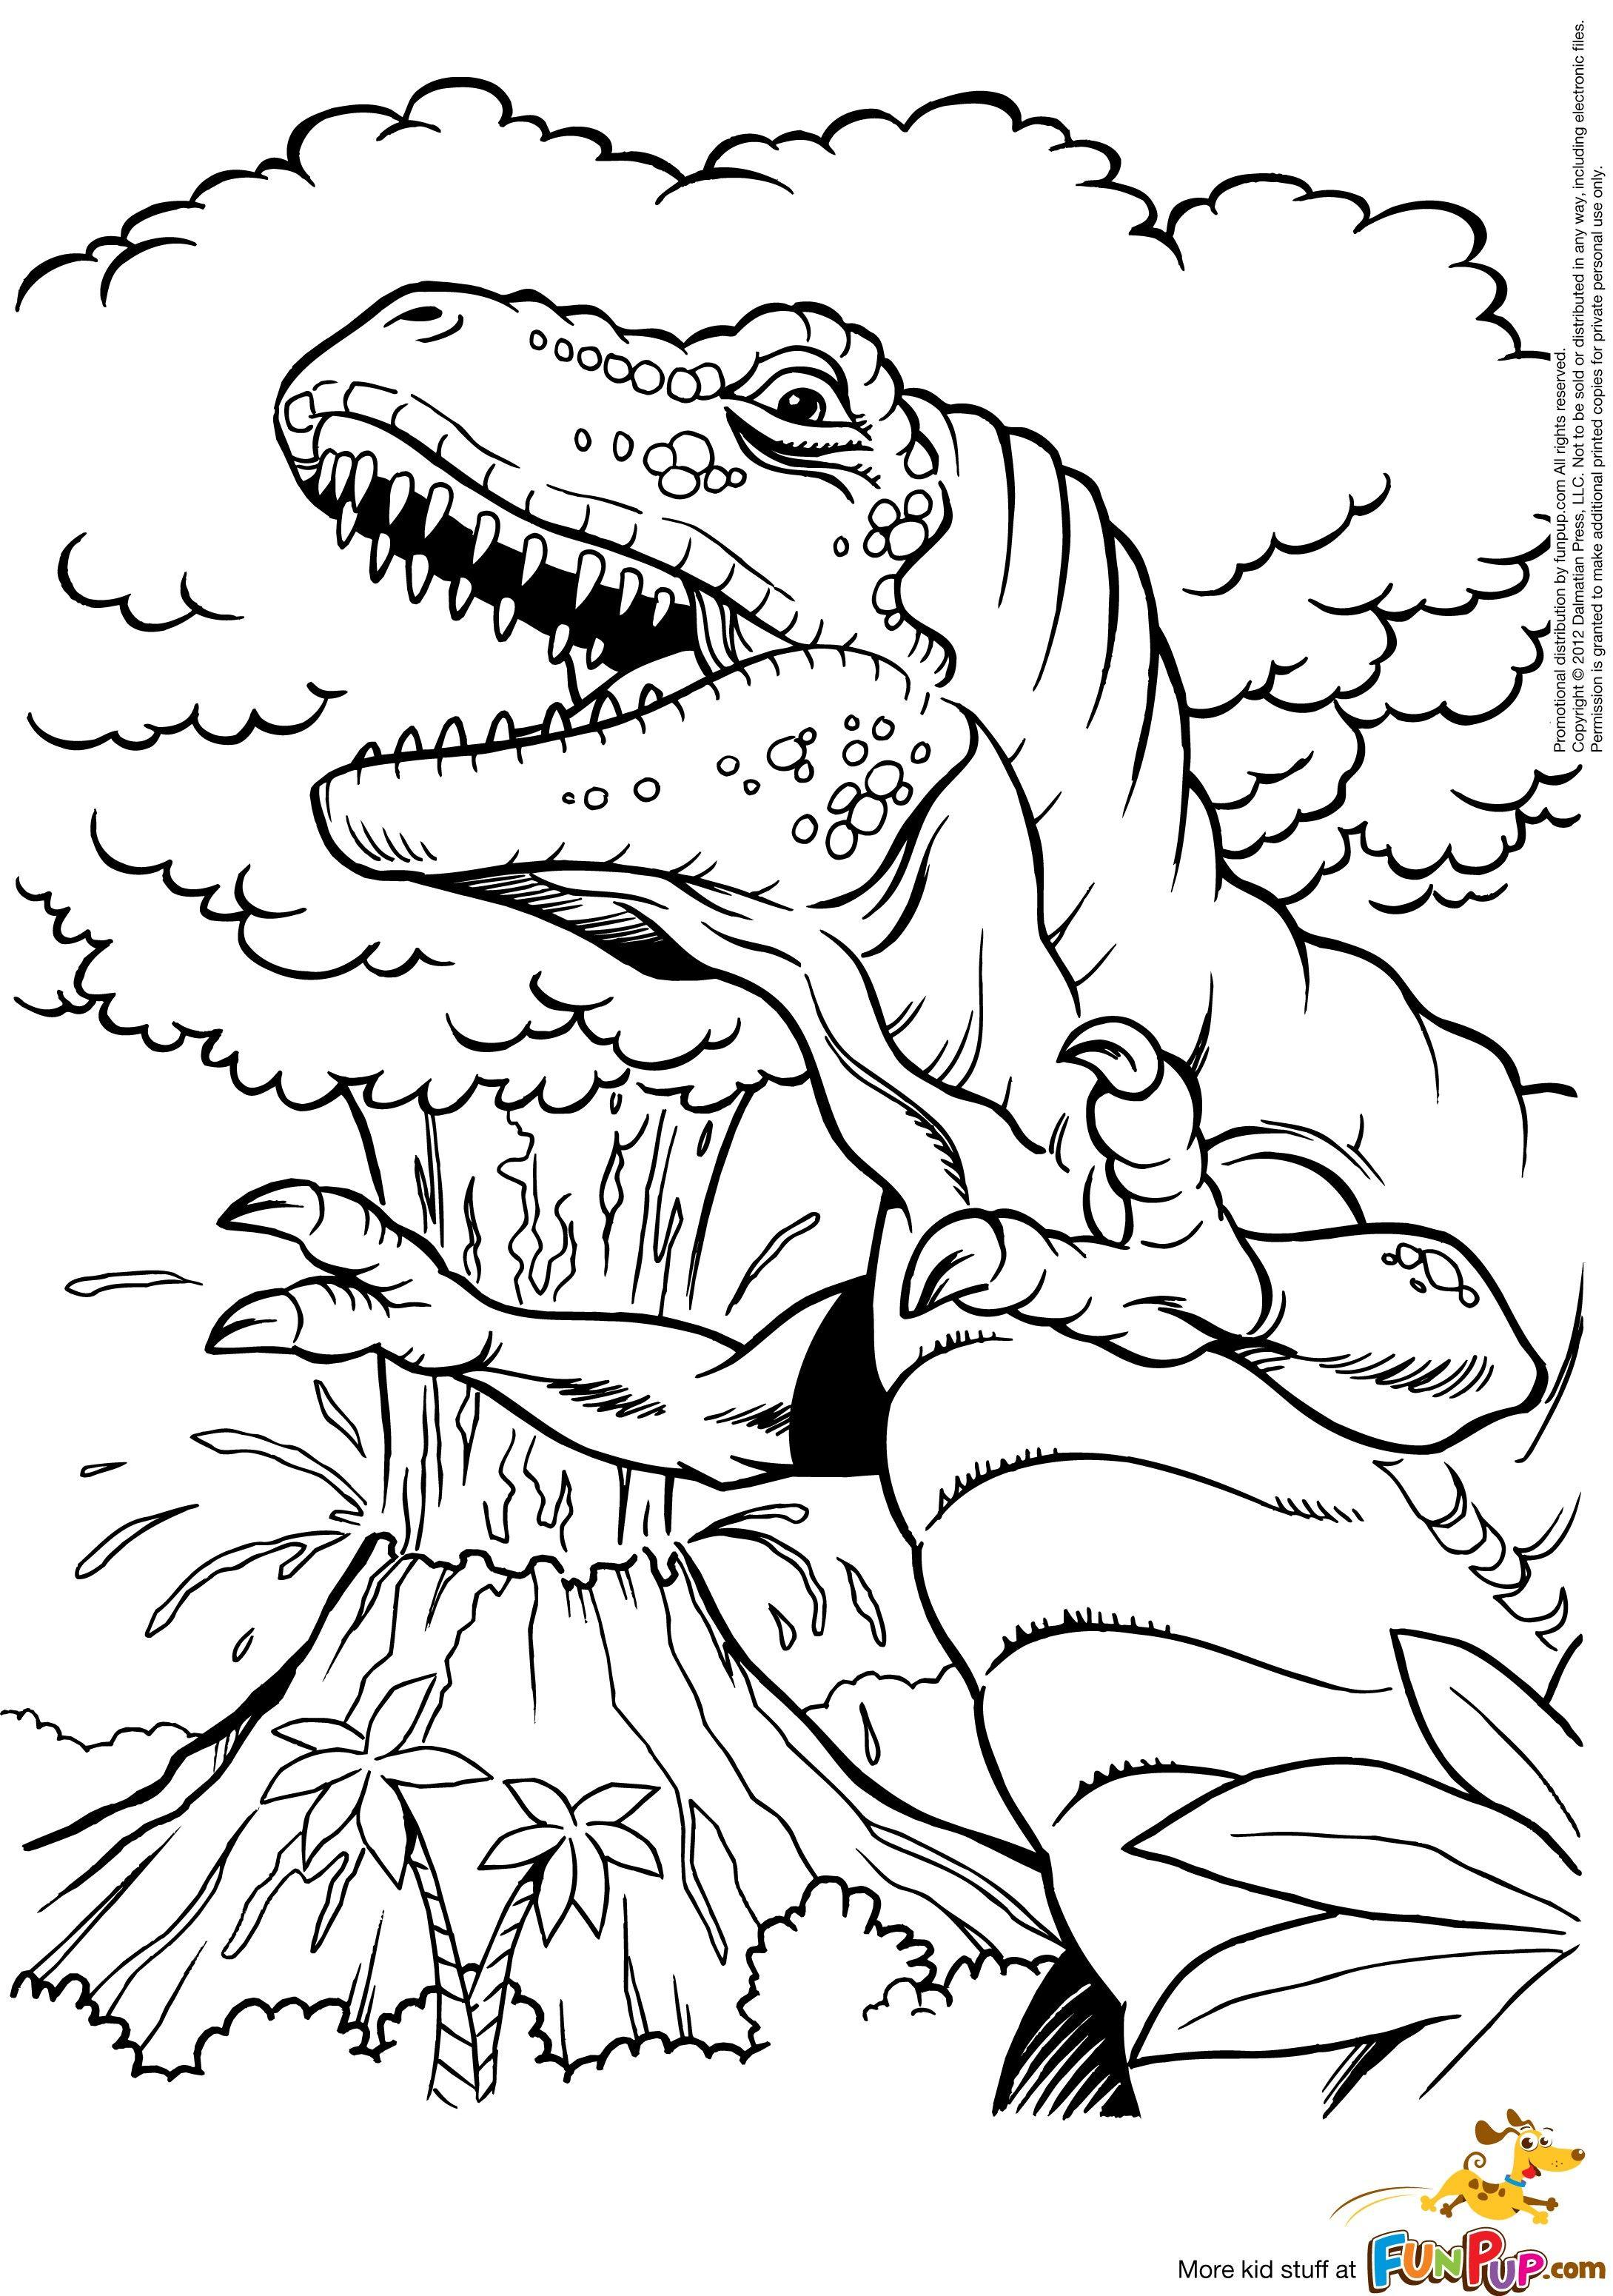 T Rex And Volcano 0 00 Coloriage Volcan T Rex Et Coloriage